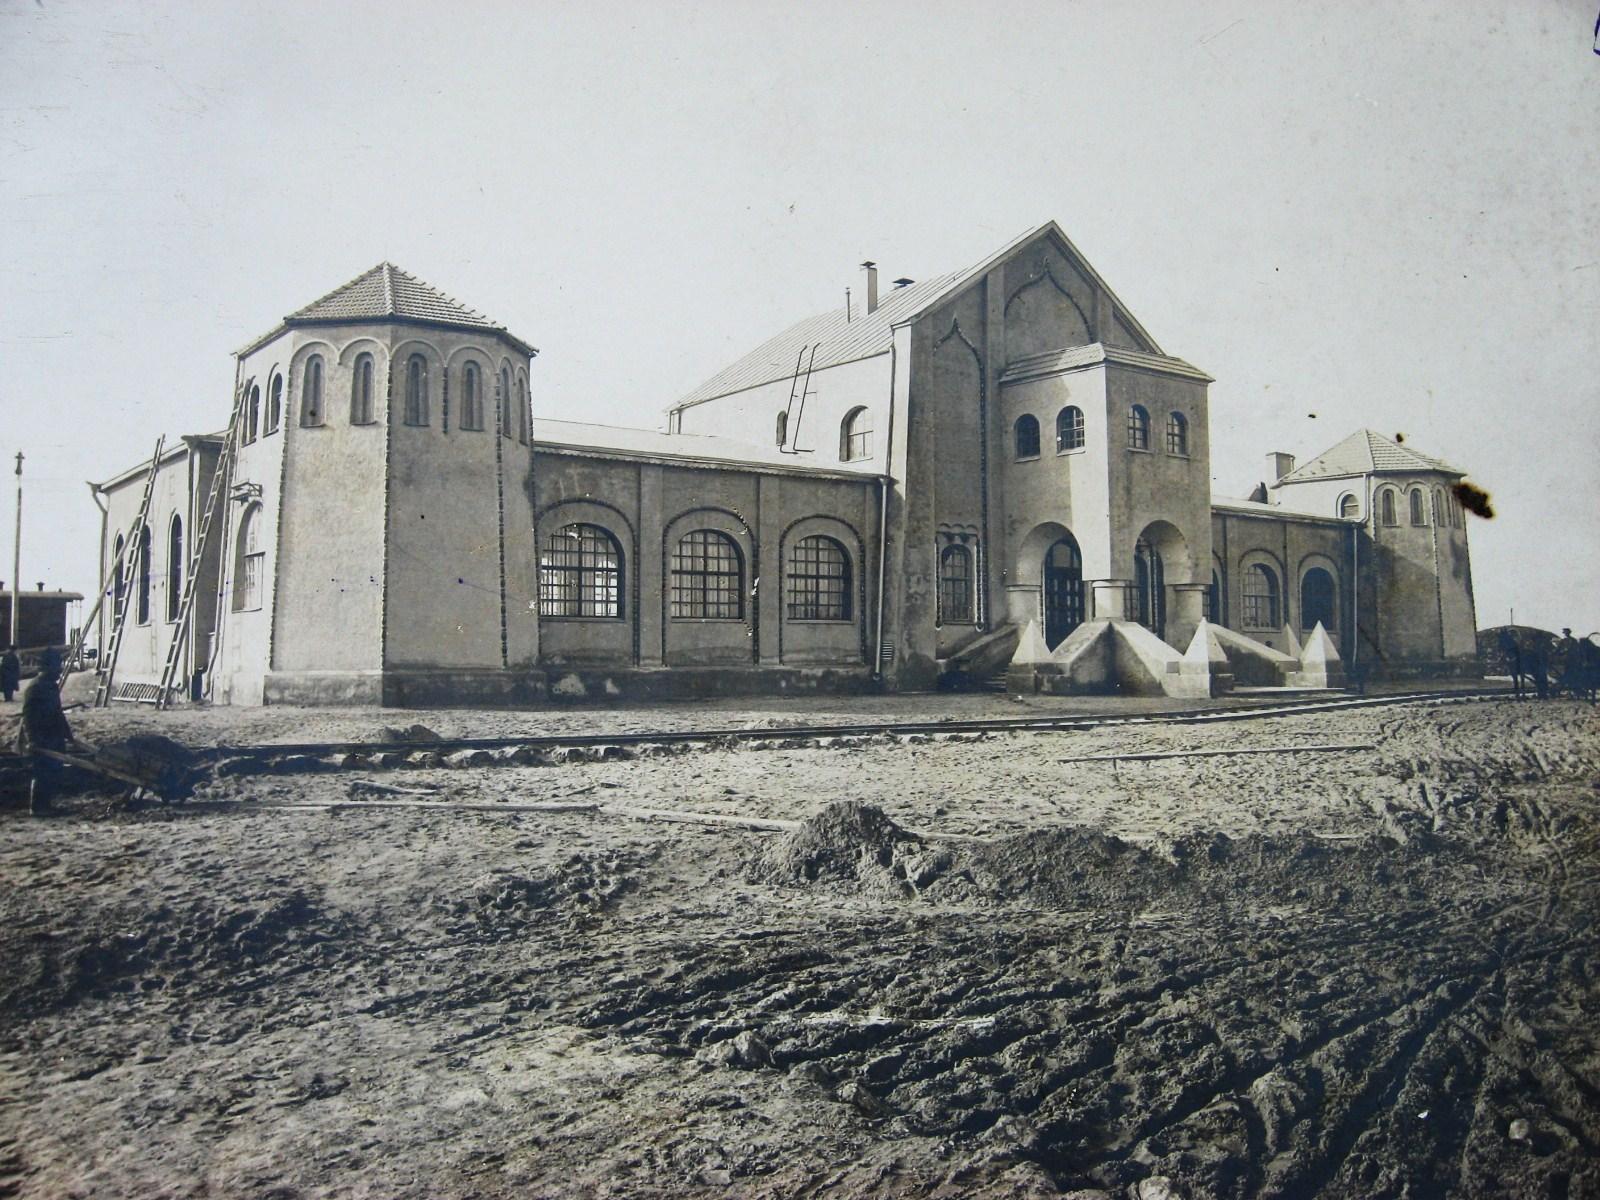 МКЖД Пассажирское здание на станции Муром. Фото 1912 год.